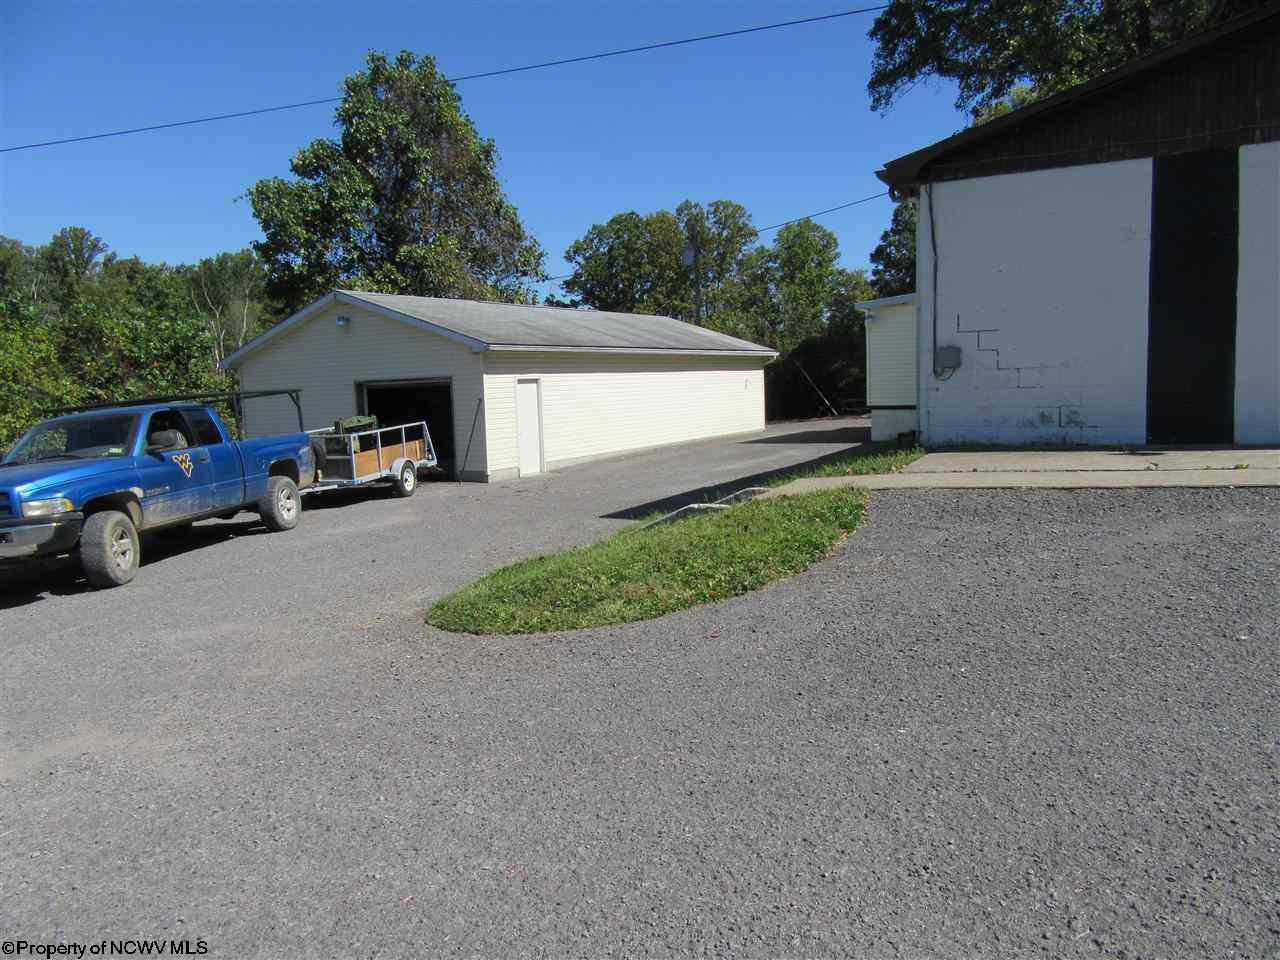 486 HAMPTON ROAD, FAIRMONT, WV 26554  Photo 10